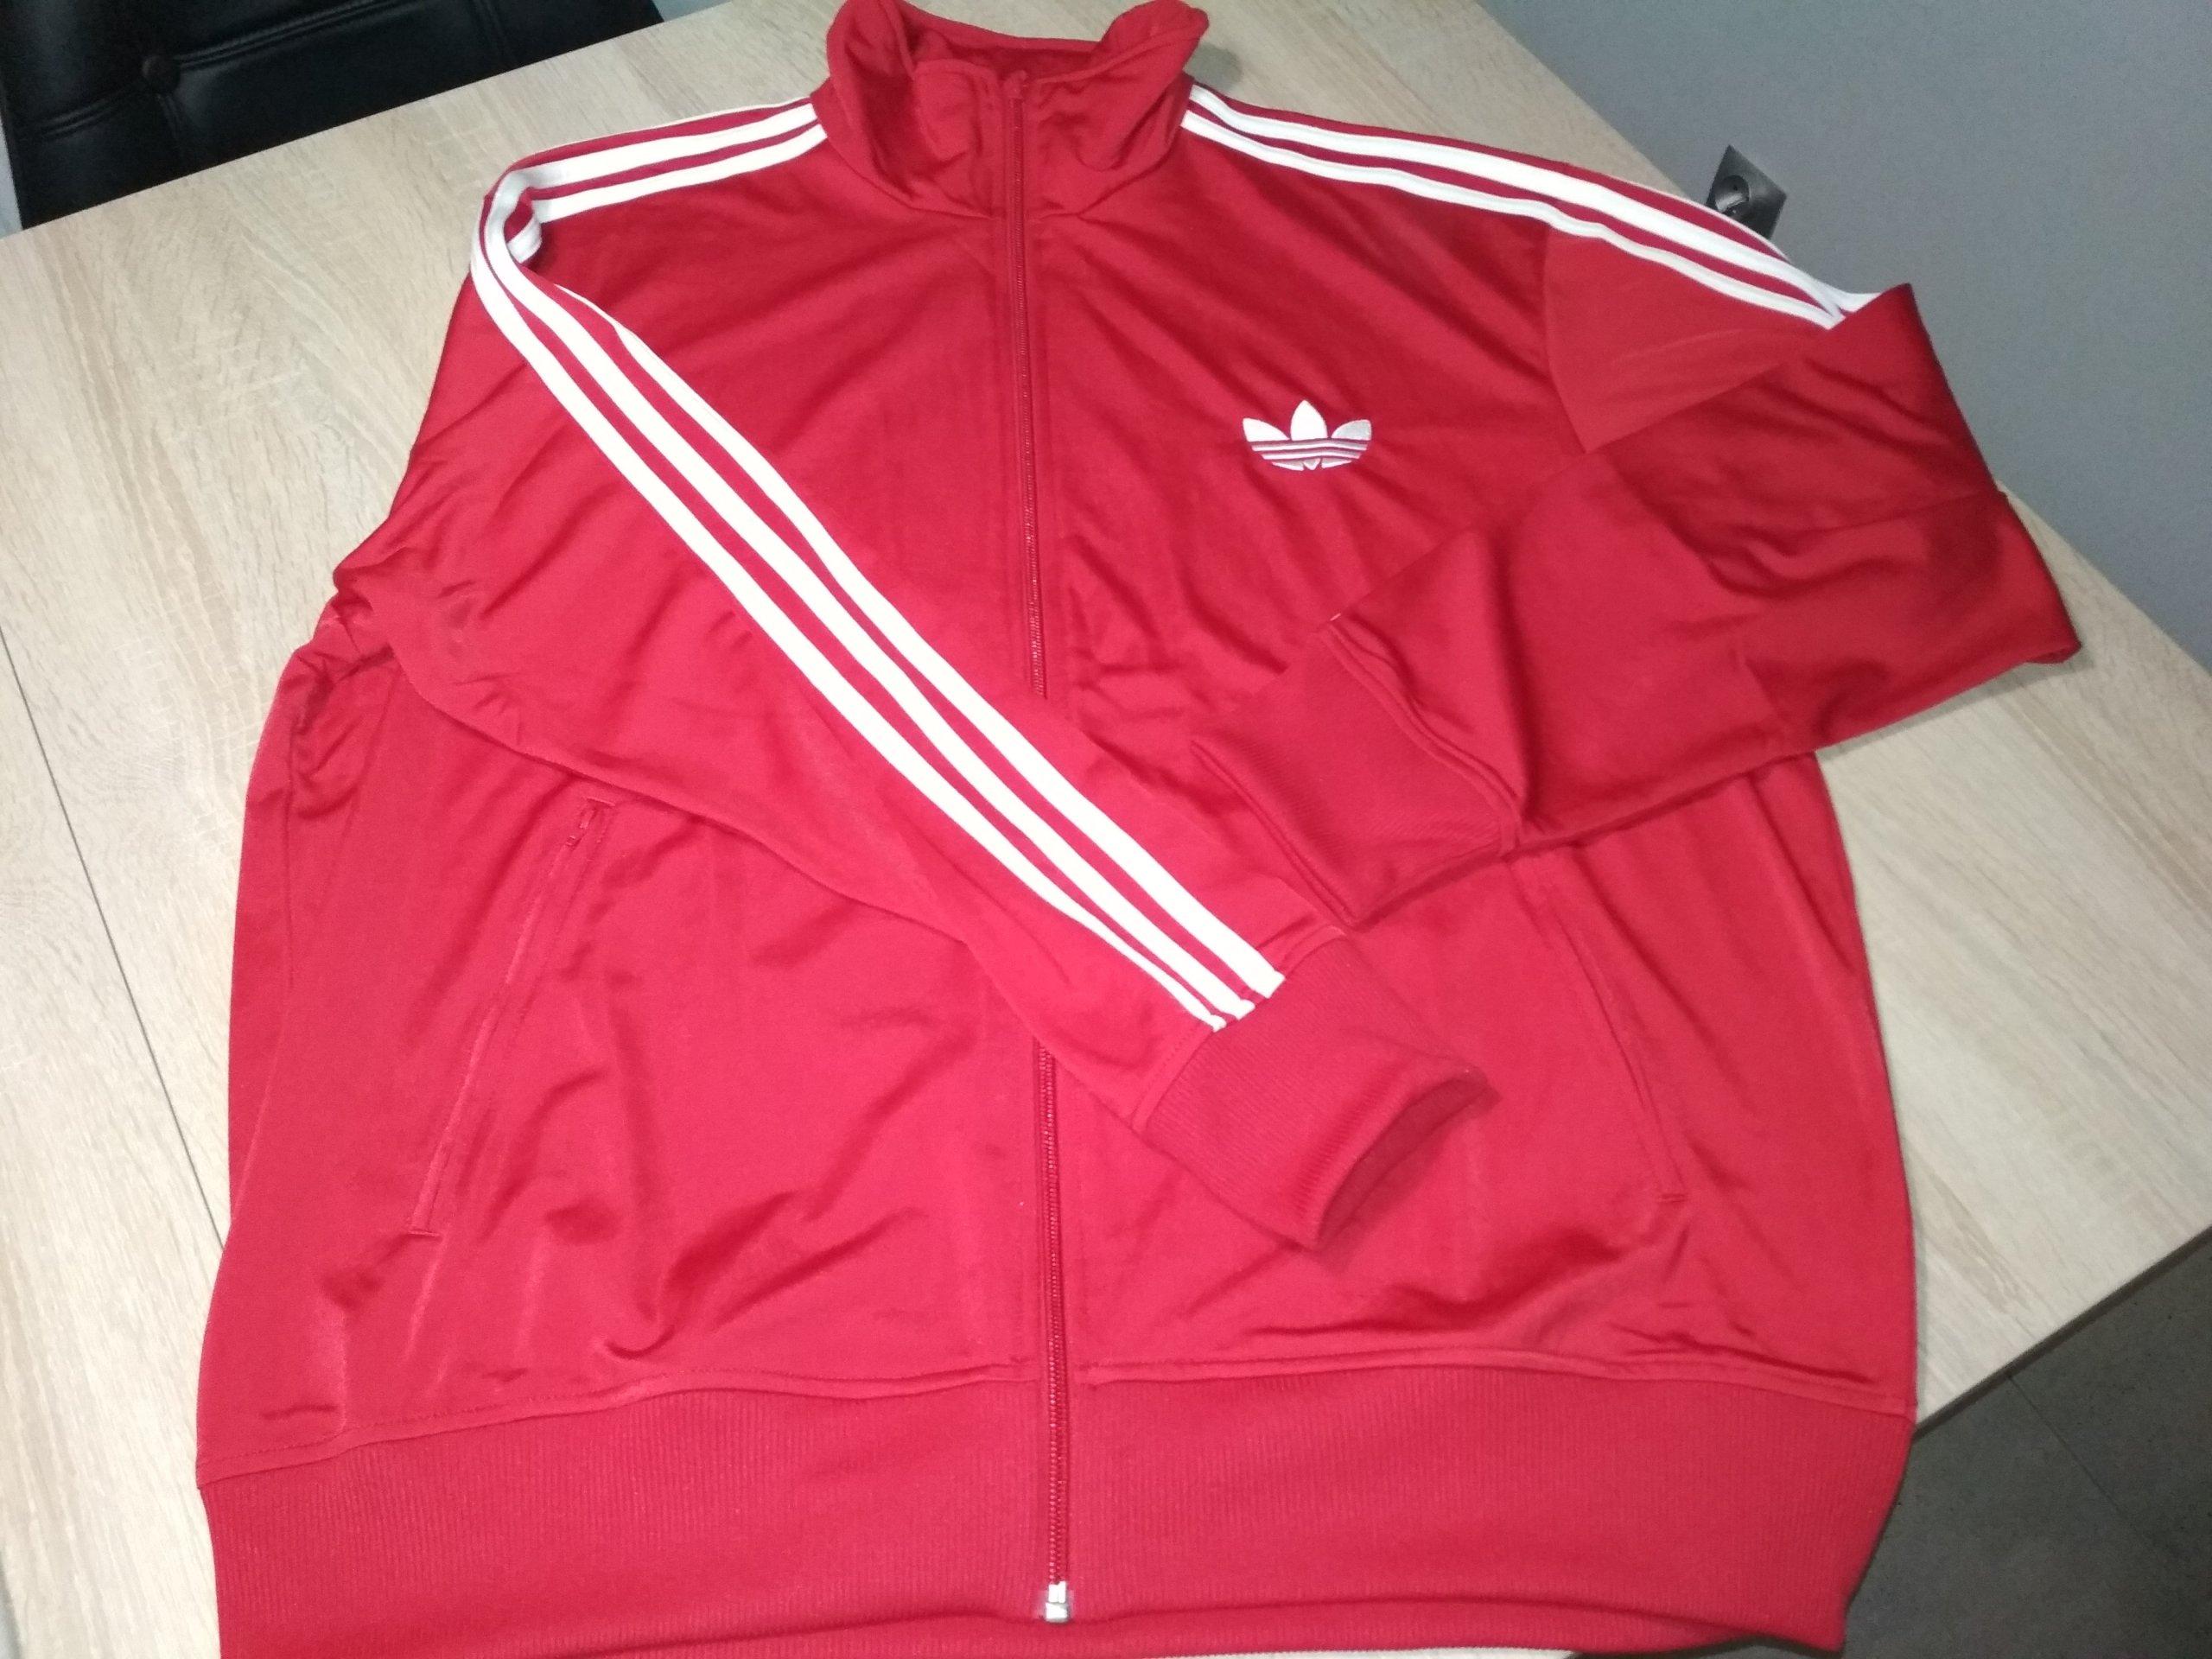 bluza adidas męska czerwona allegro